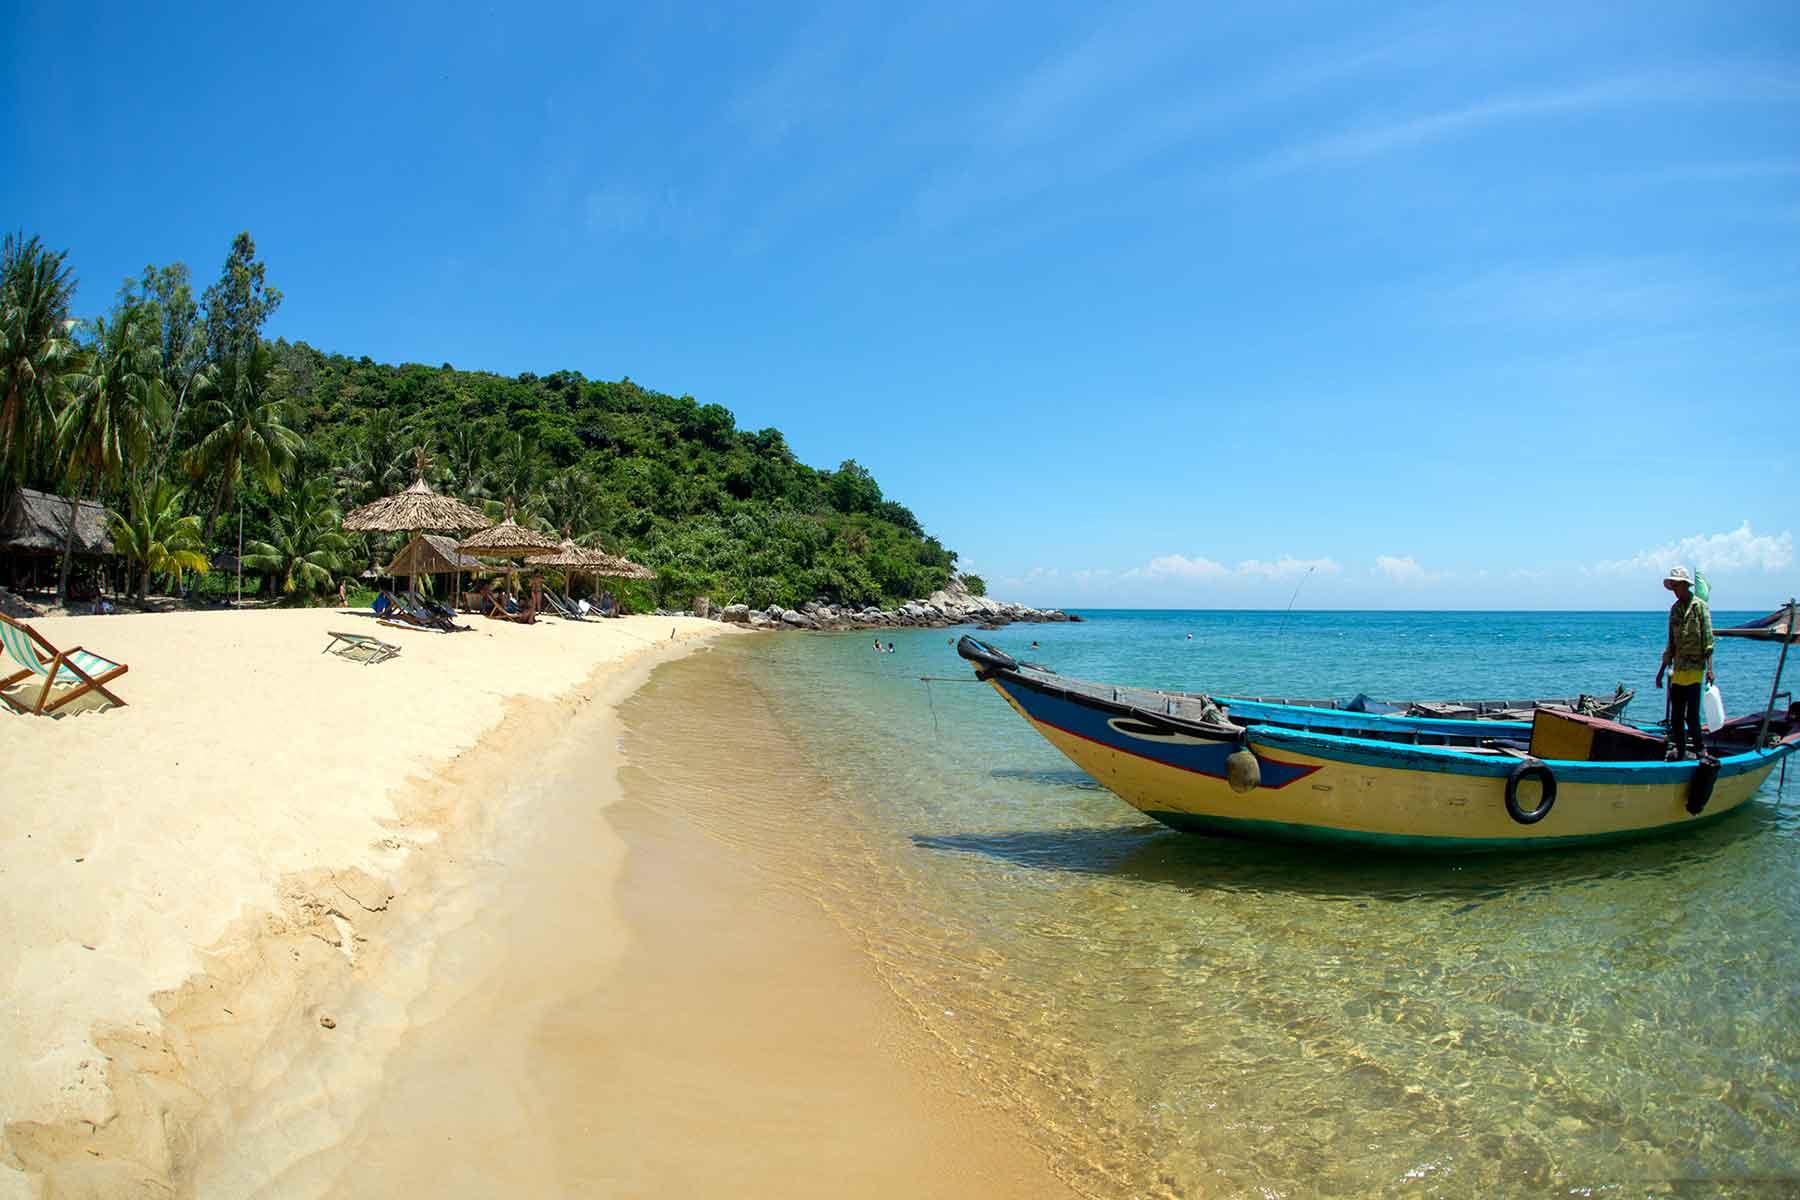 Cham Island tour from Da Nang